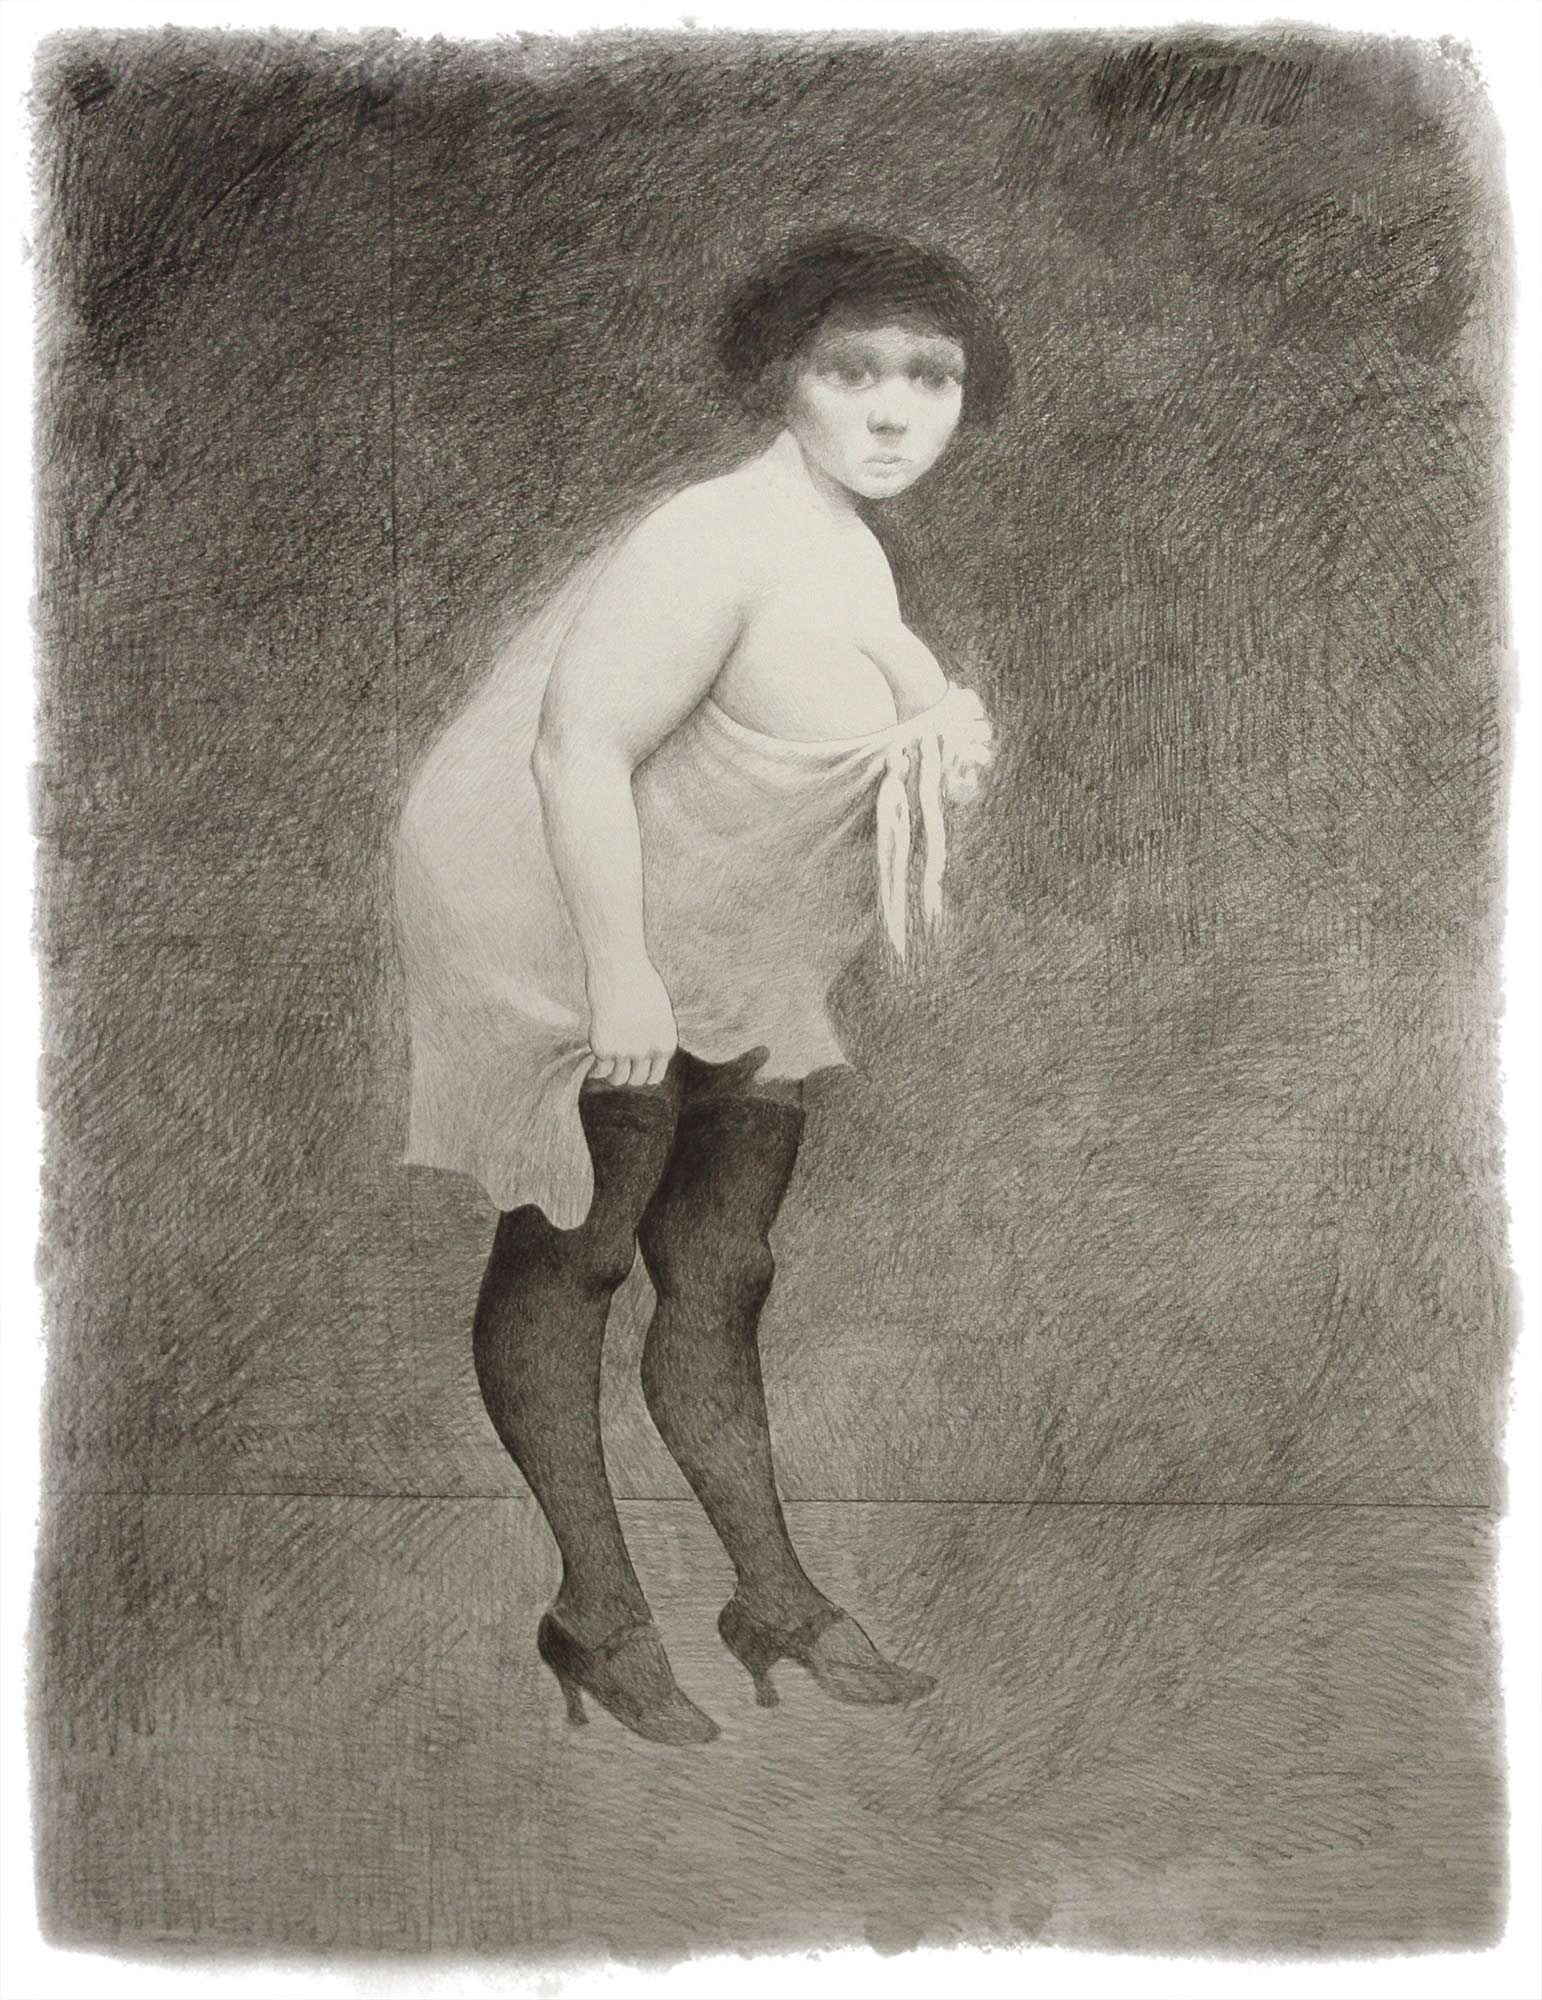 black-stockings-drawing-copy-3.jpg